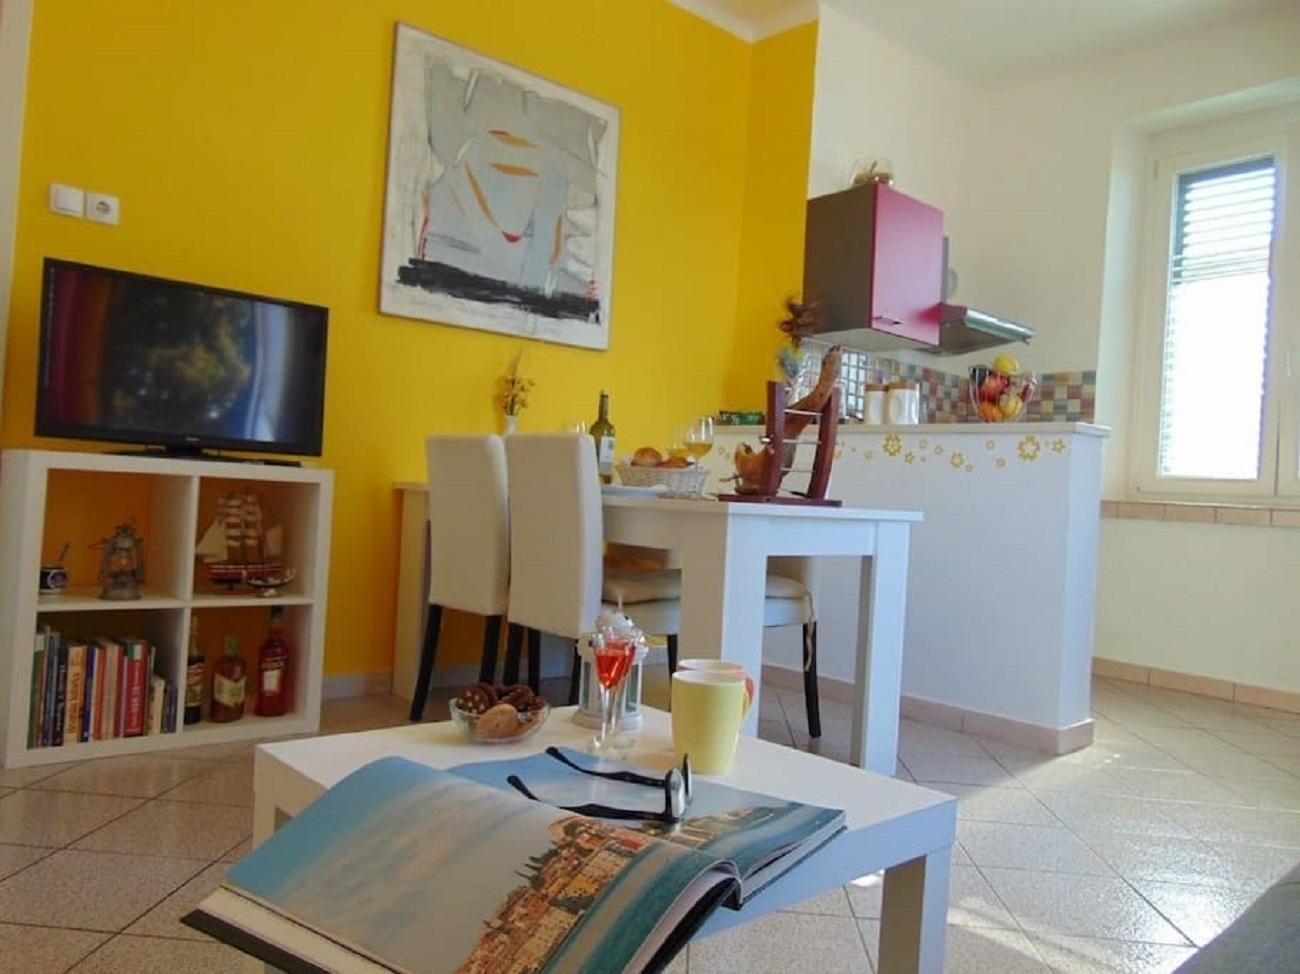 Apartamente Apartment Rajka - 20 m from beach: Rajka Koromacno, Istria 52340, Koromacno, , Regiunea Istria